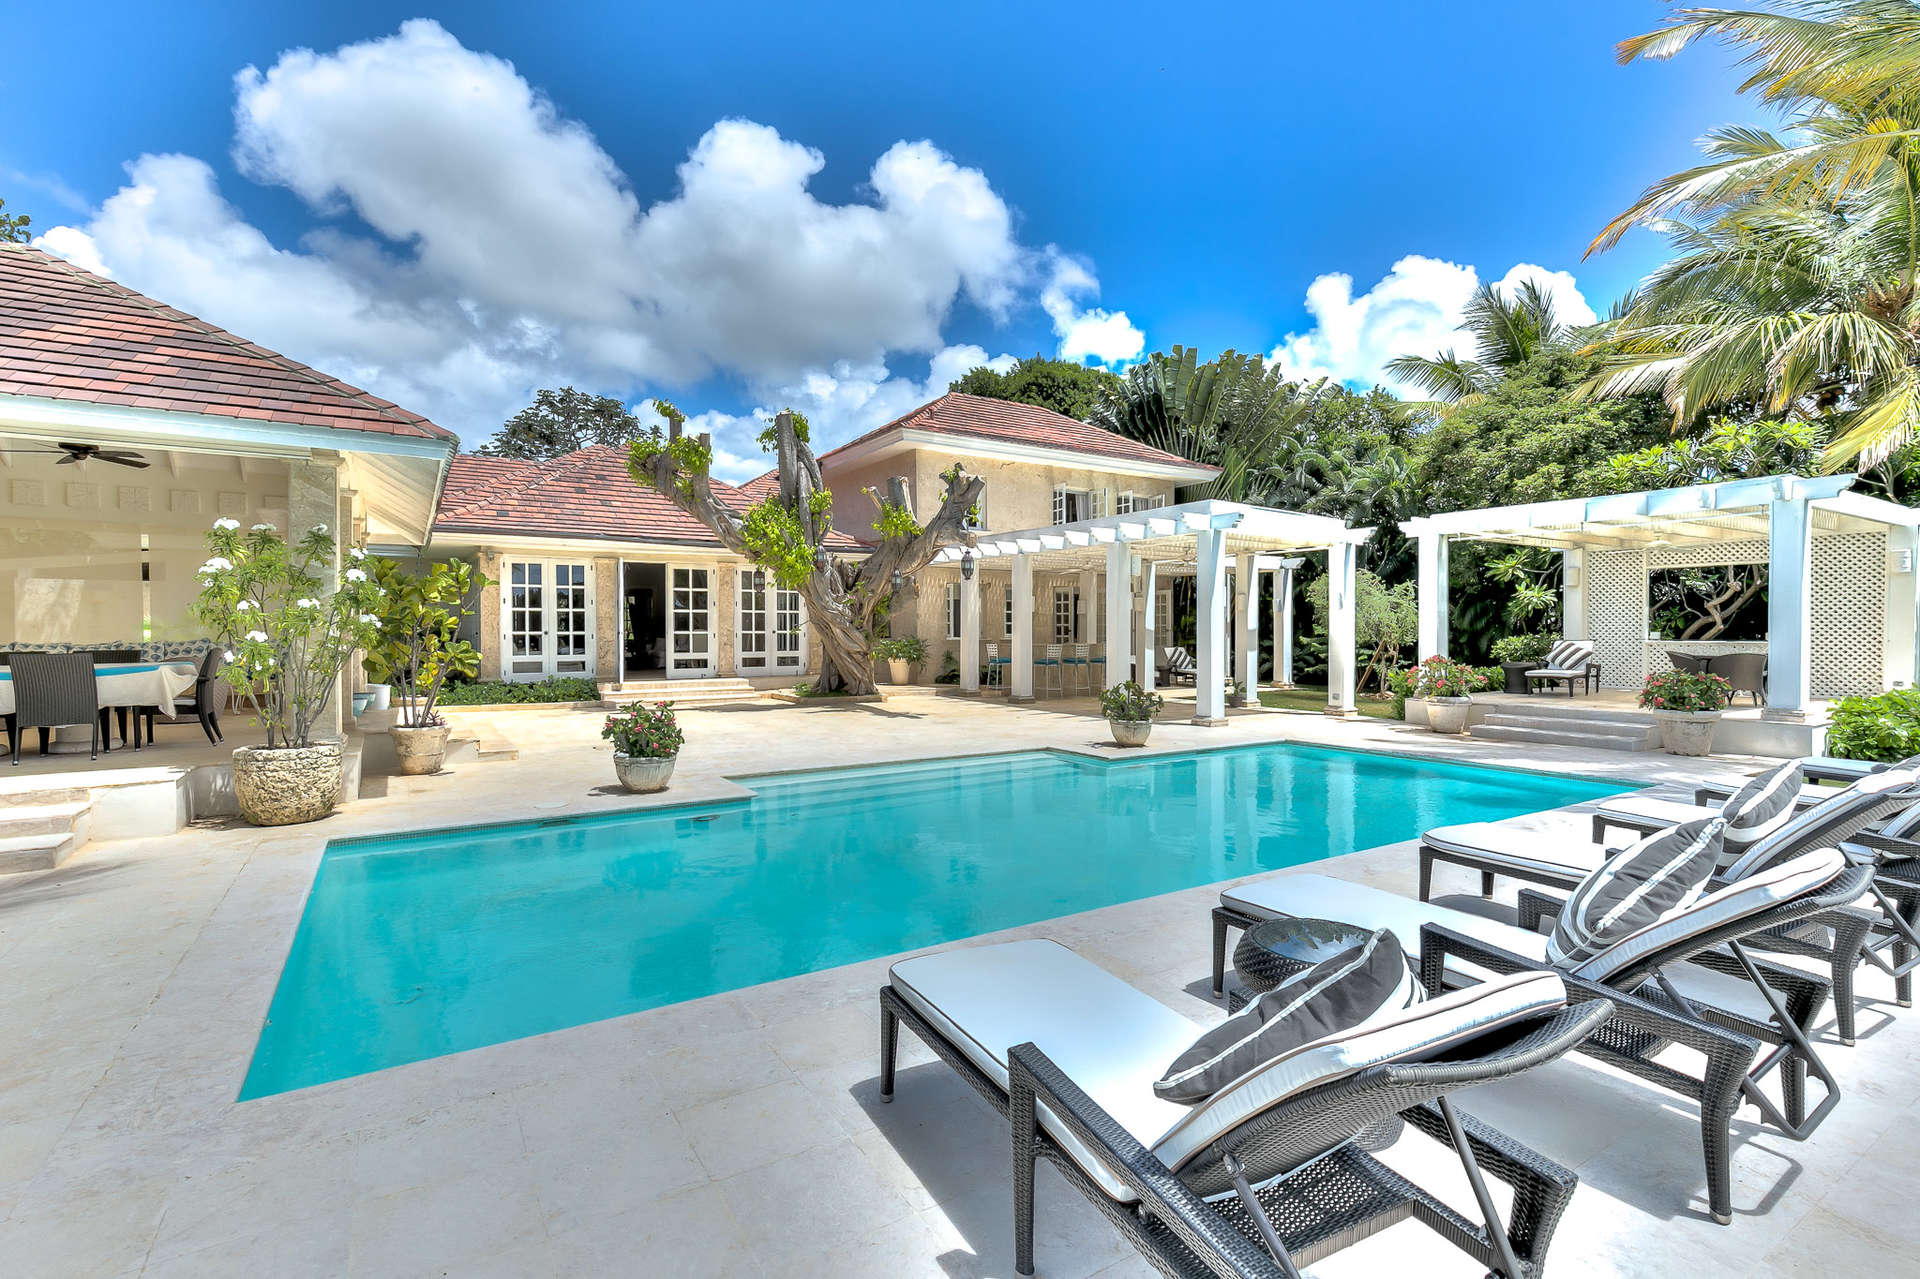 Luxury villa rentals caribbean - Dominican republic - Punta cana - Punta cana resort and club - Tortuga C20 - Image 1/23